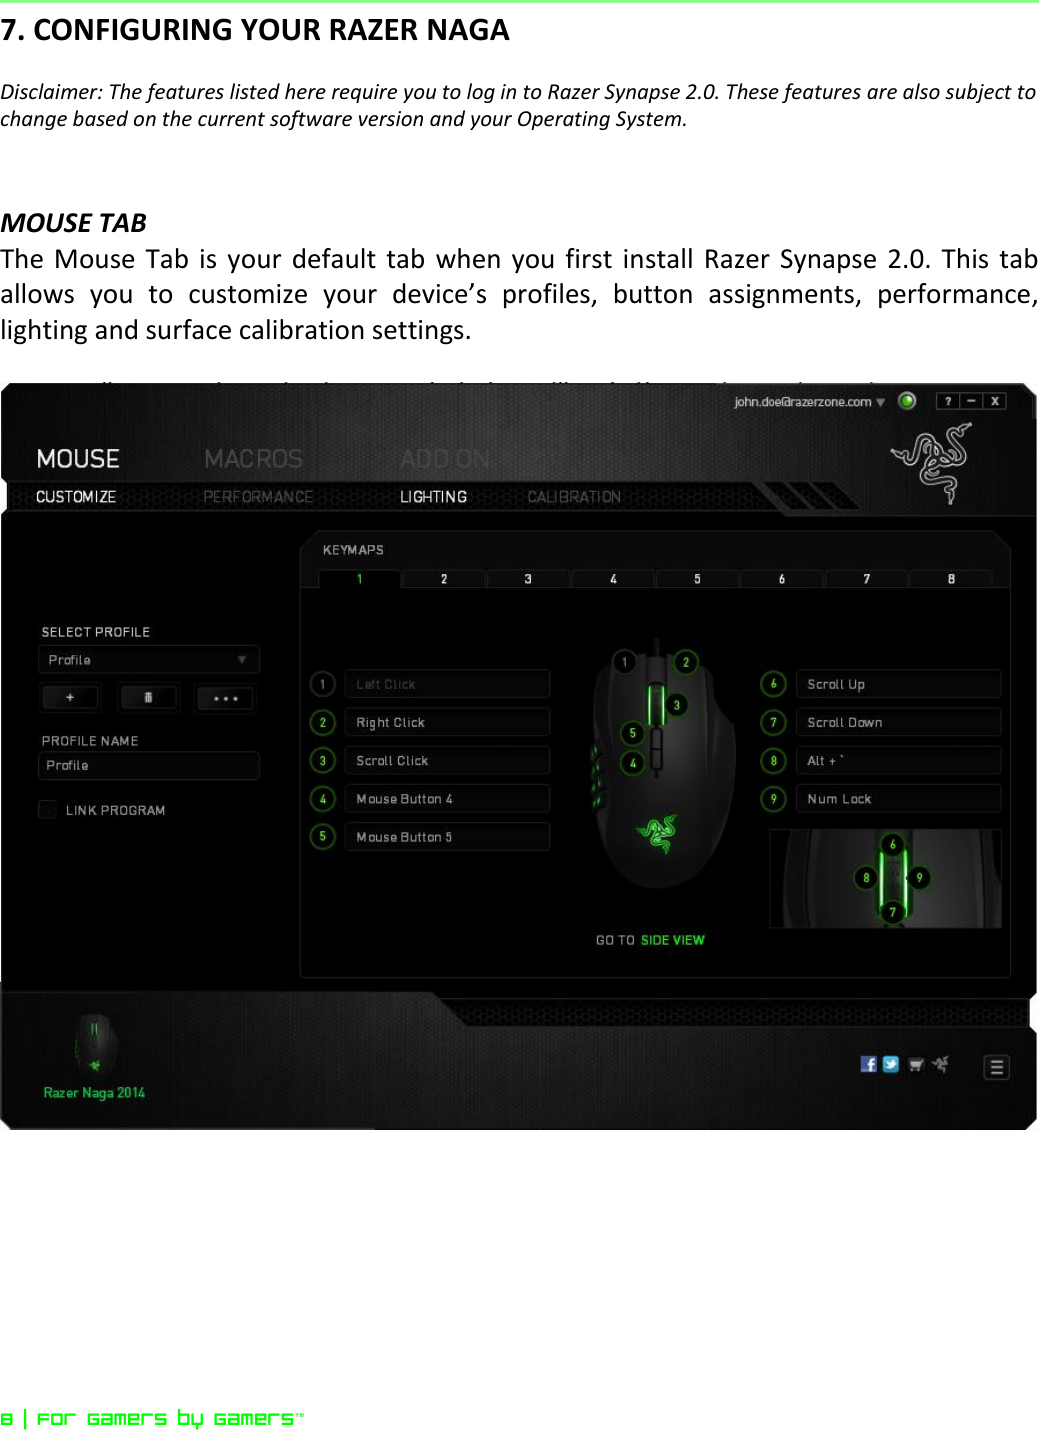 Razer Naga 2014 Owner S Manual Online Master Guide